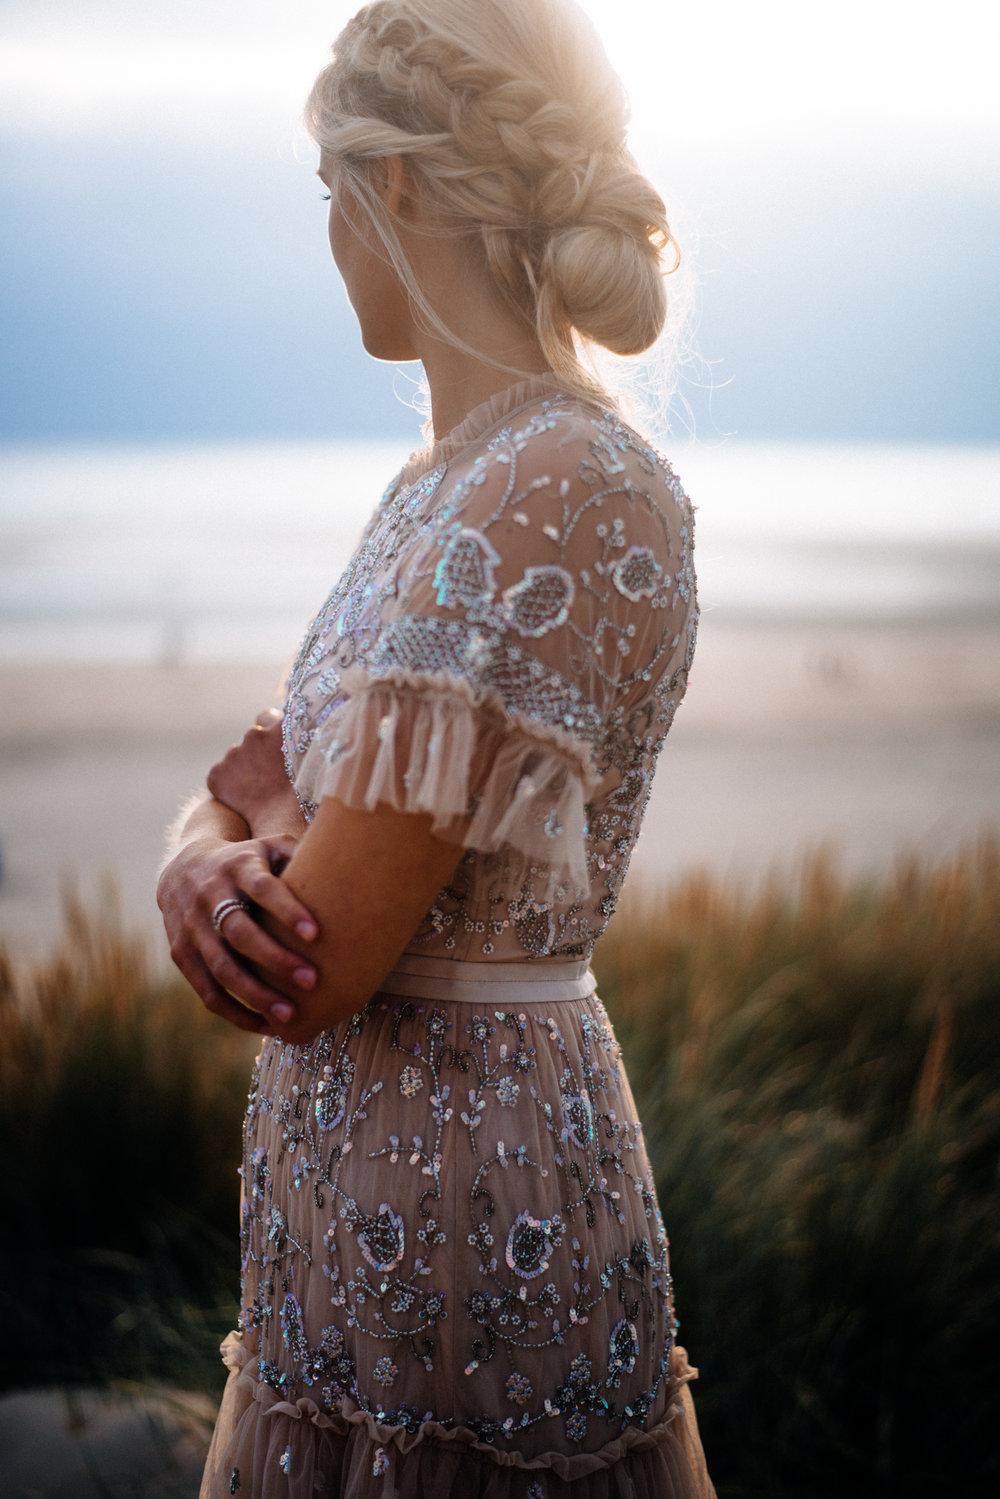 the beach hair stylist and makeup artist